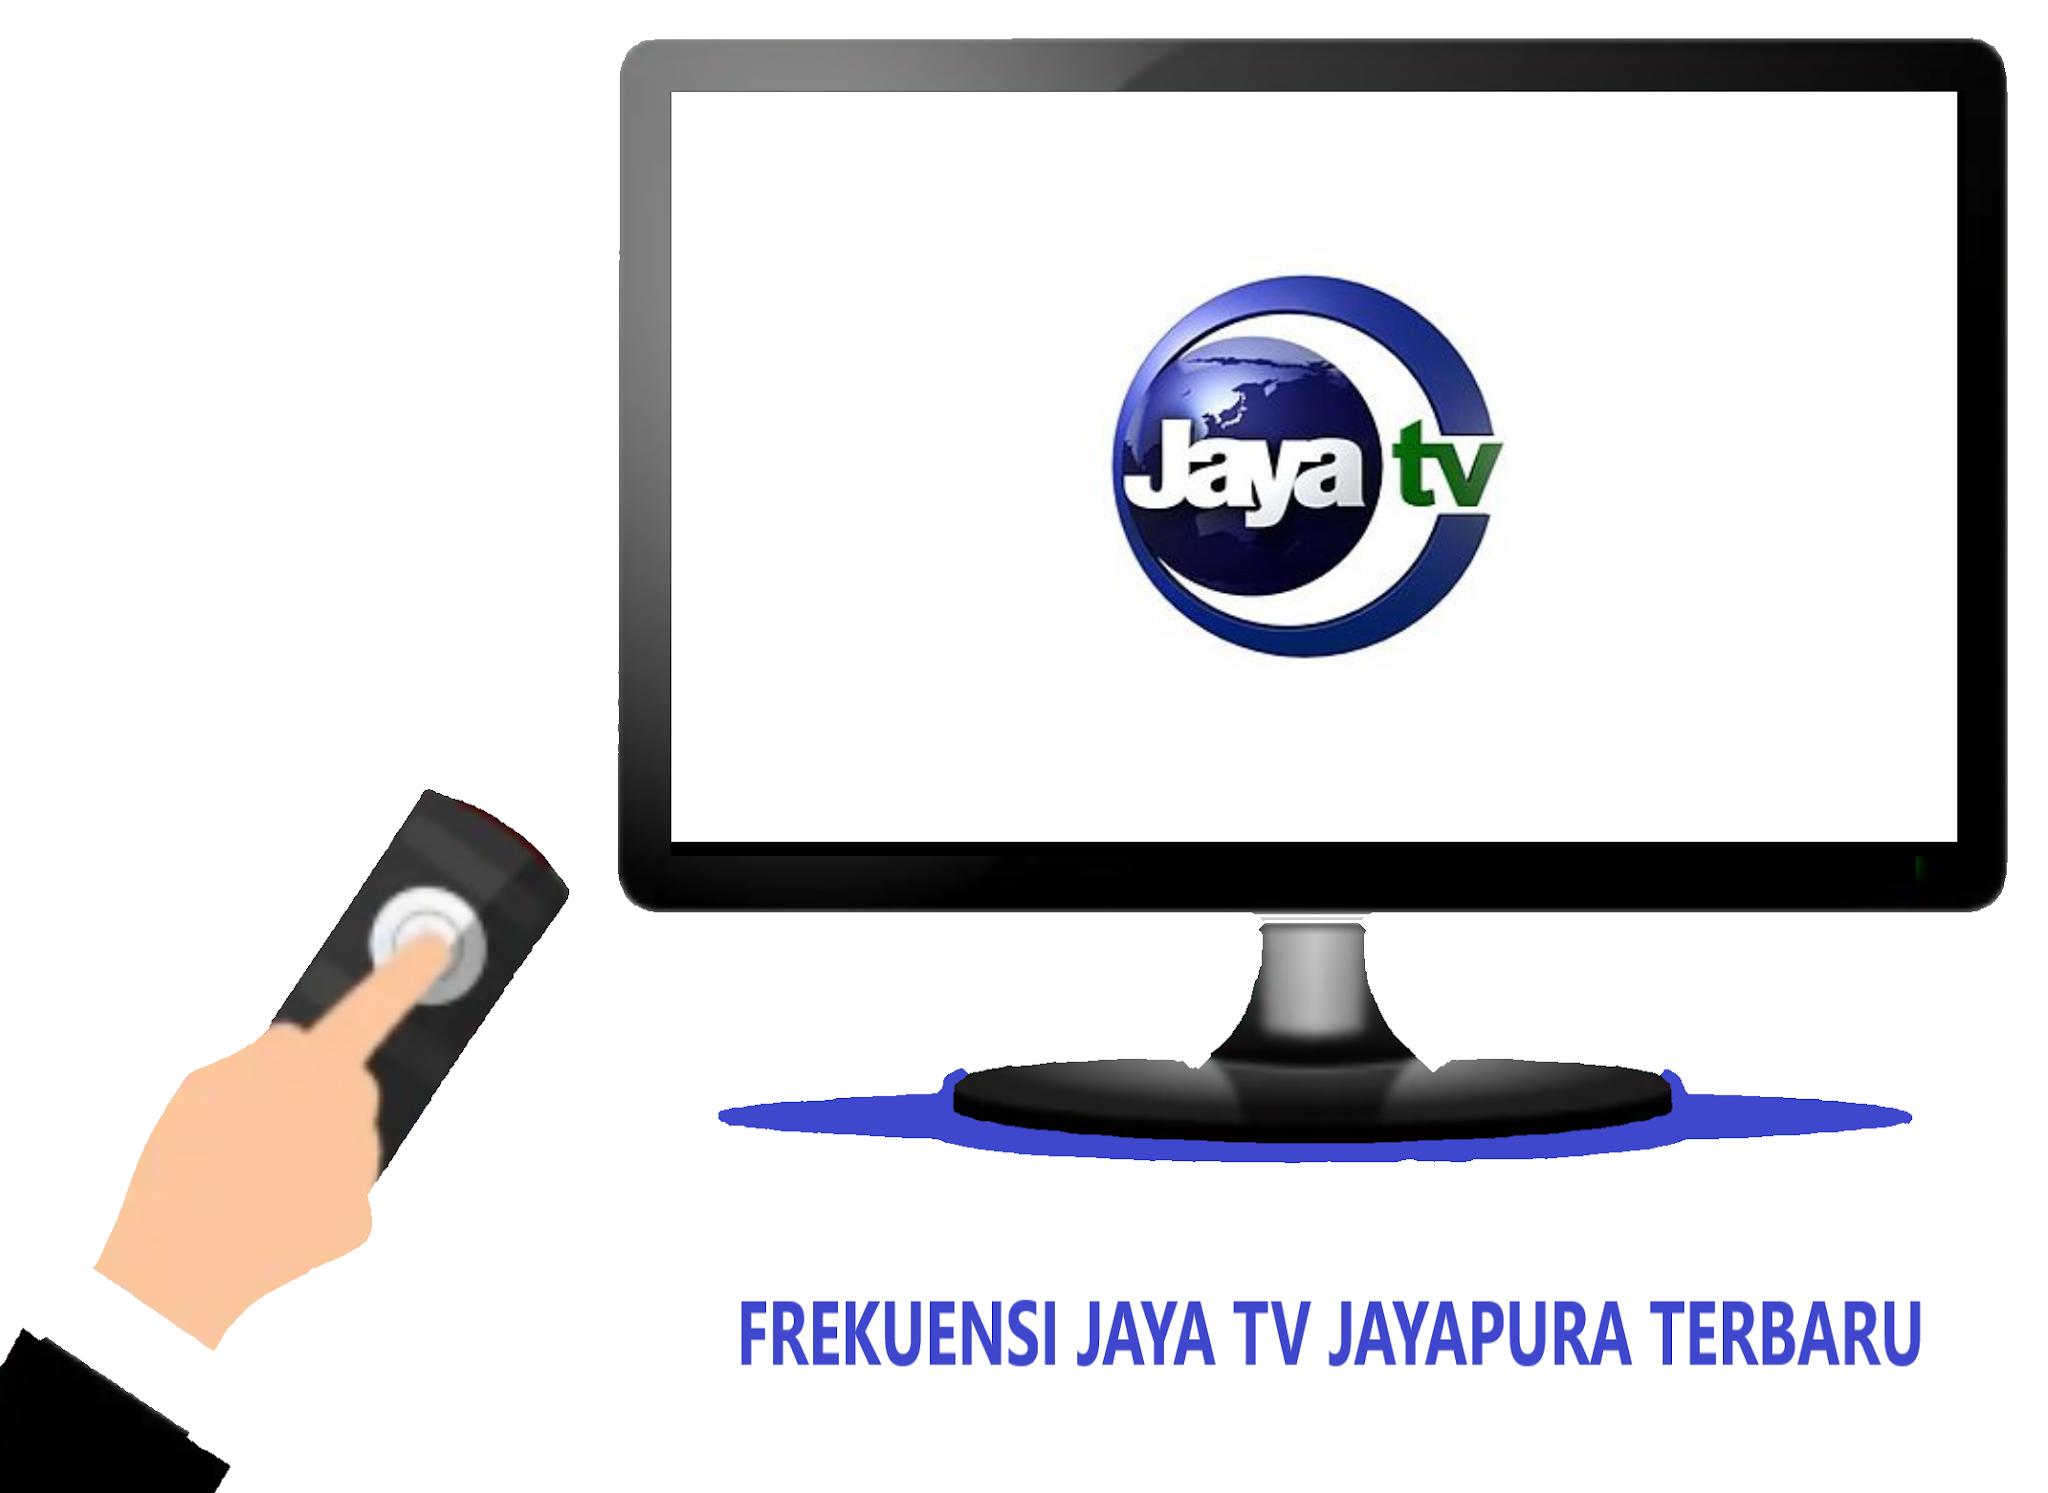 Frekuensi Jaya TV Jayapura Terbaru Di Telkom 4 2020